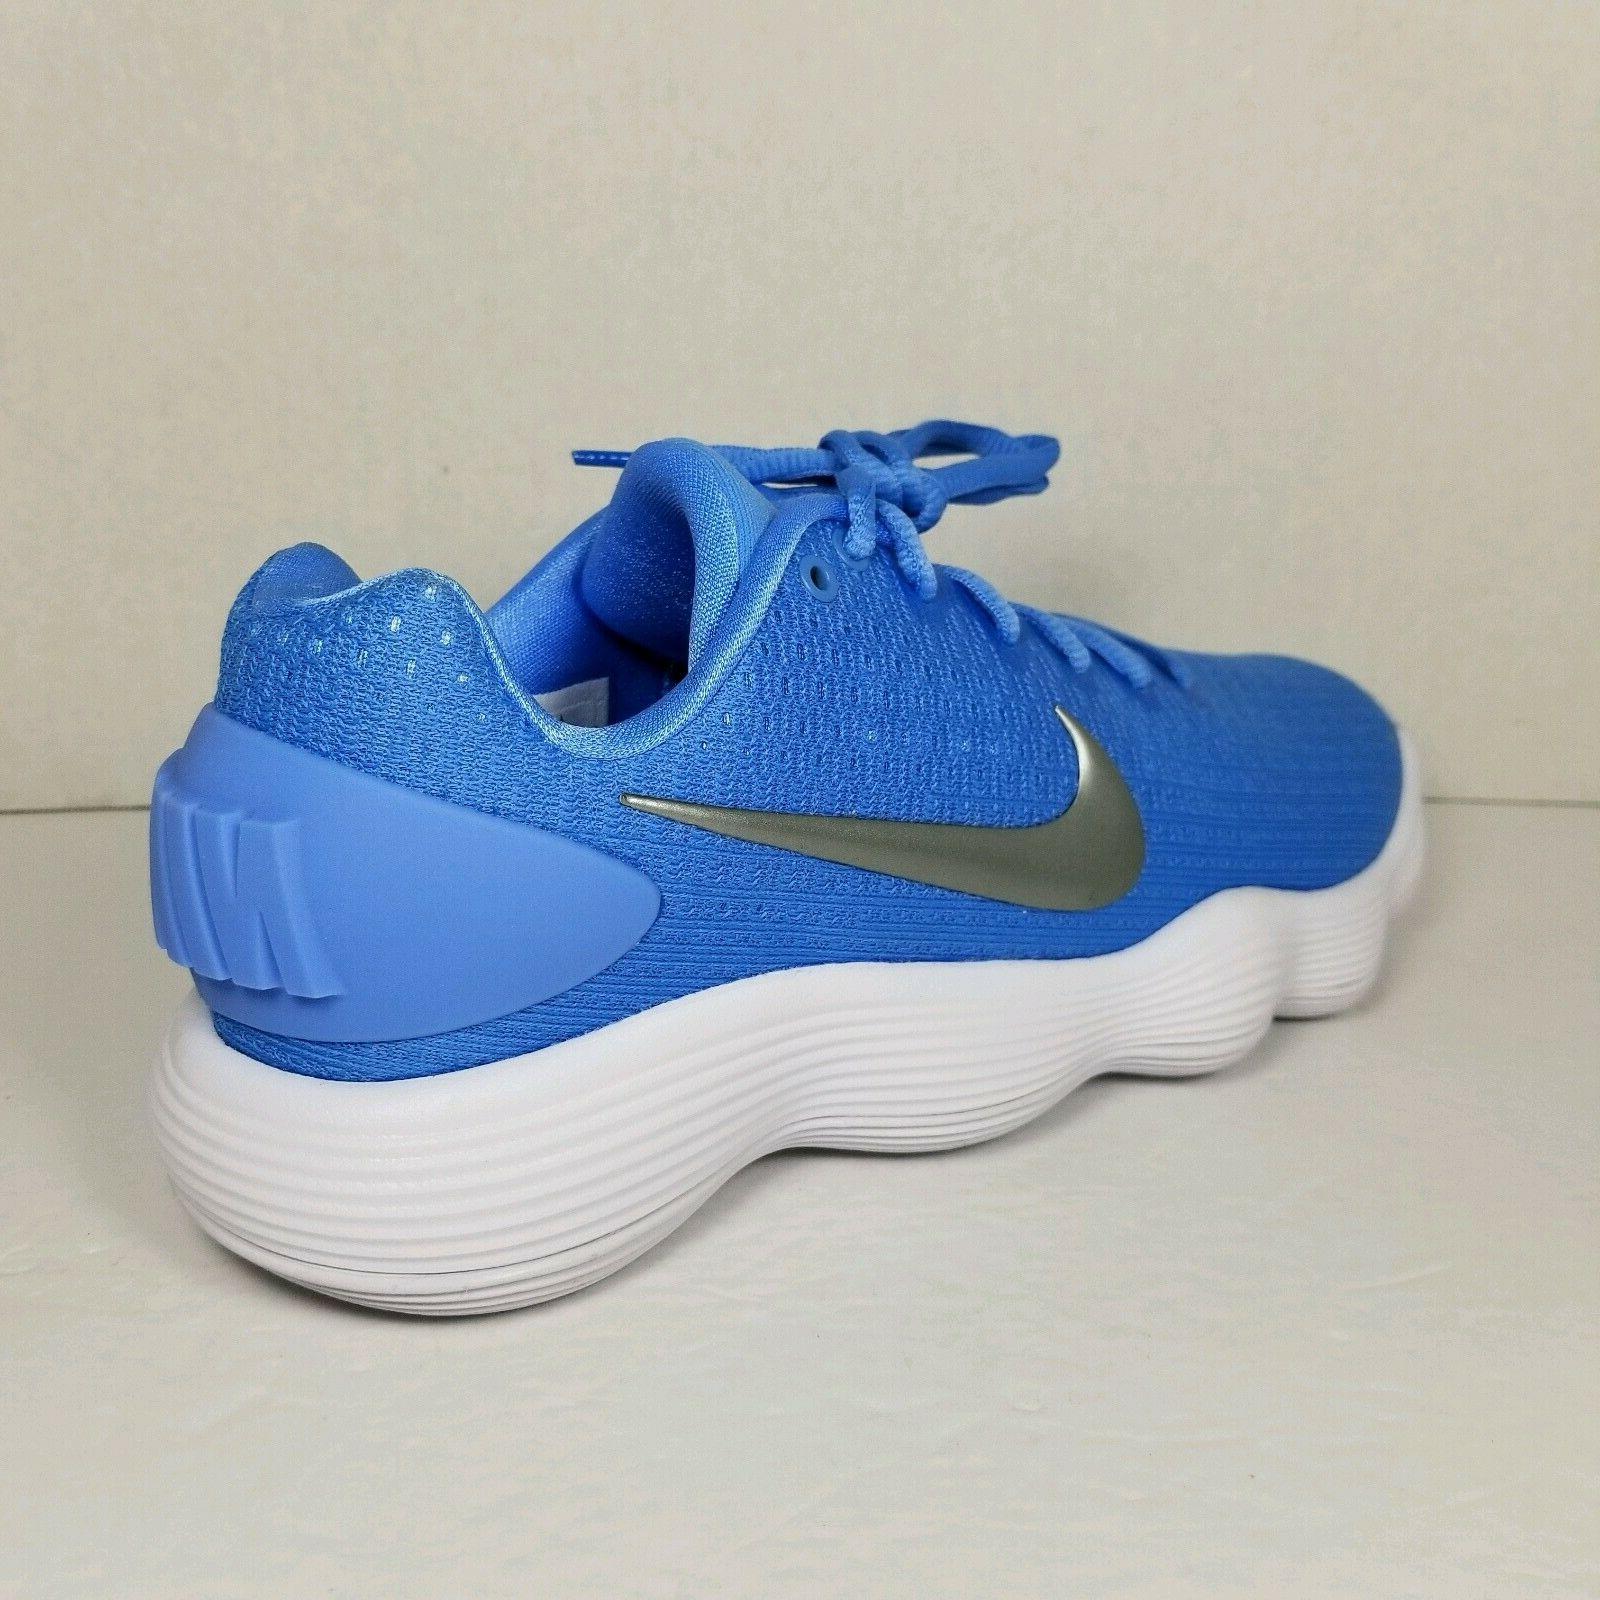 Nike Hyperdunk Blue Shoes - Size